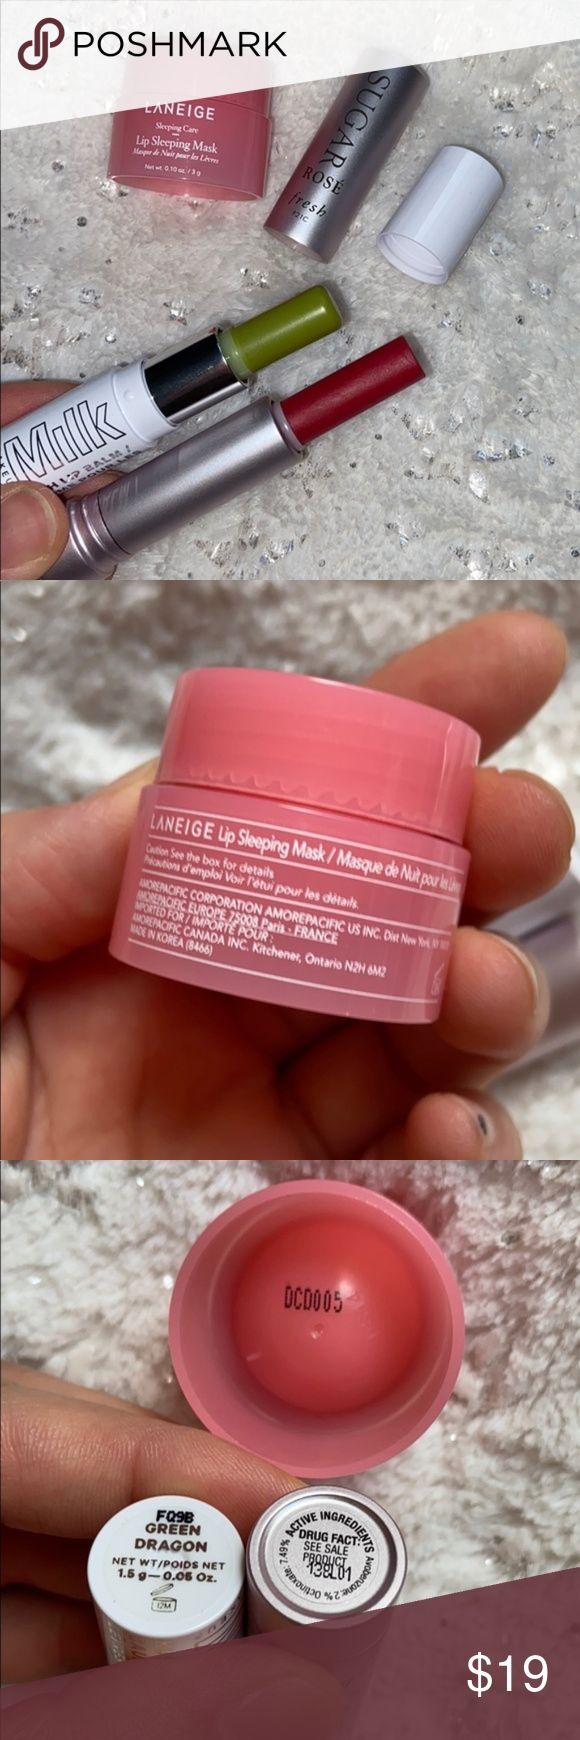 3 lip balmsMilk makeup/Laneige/Fresh 3 travel size bundle